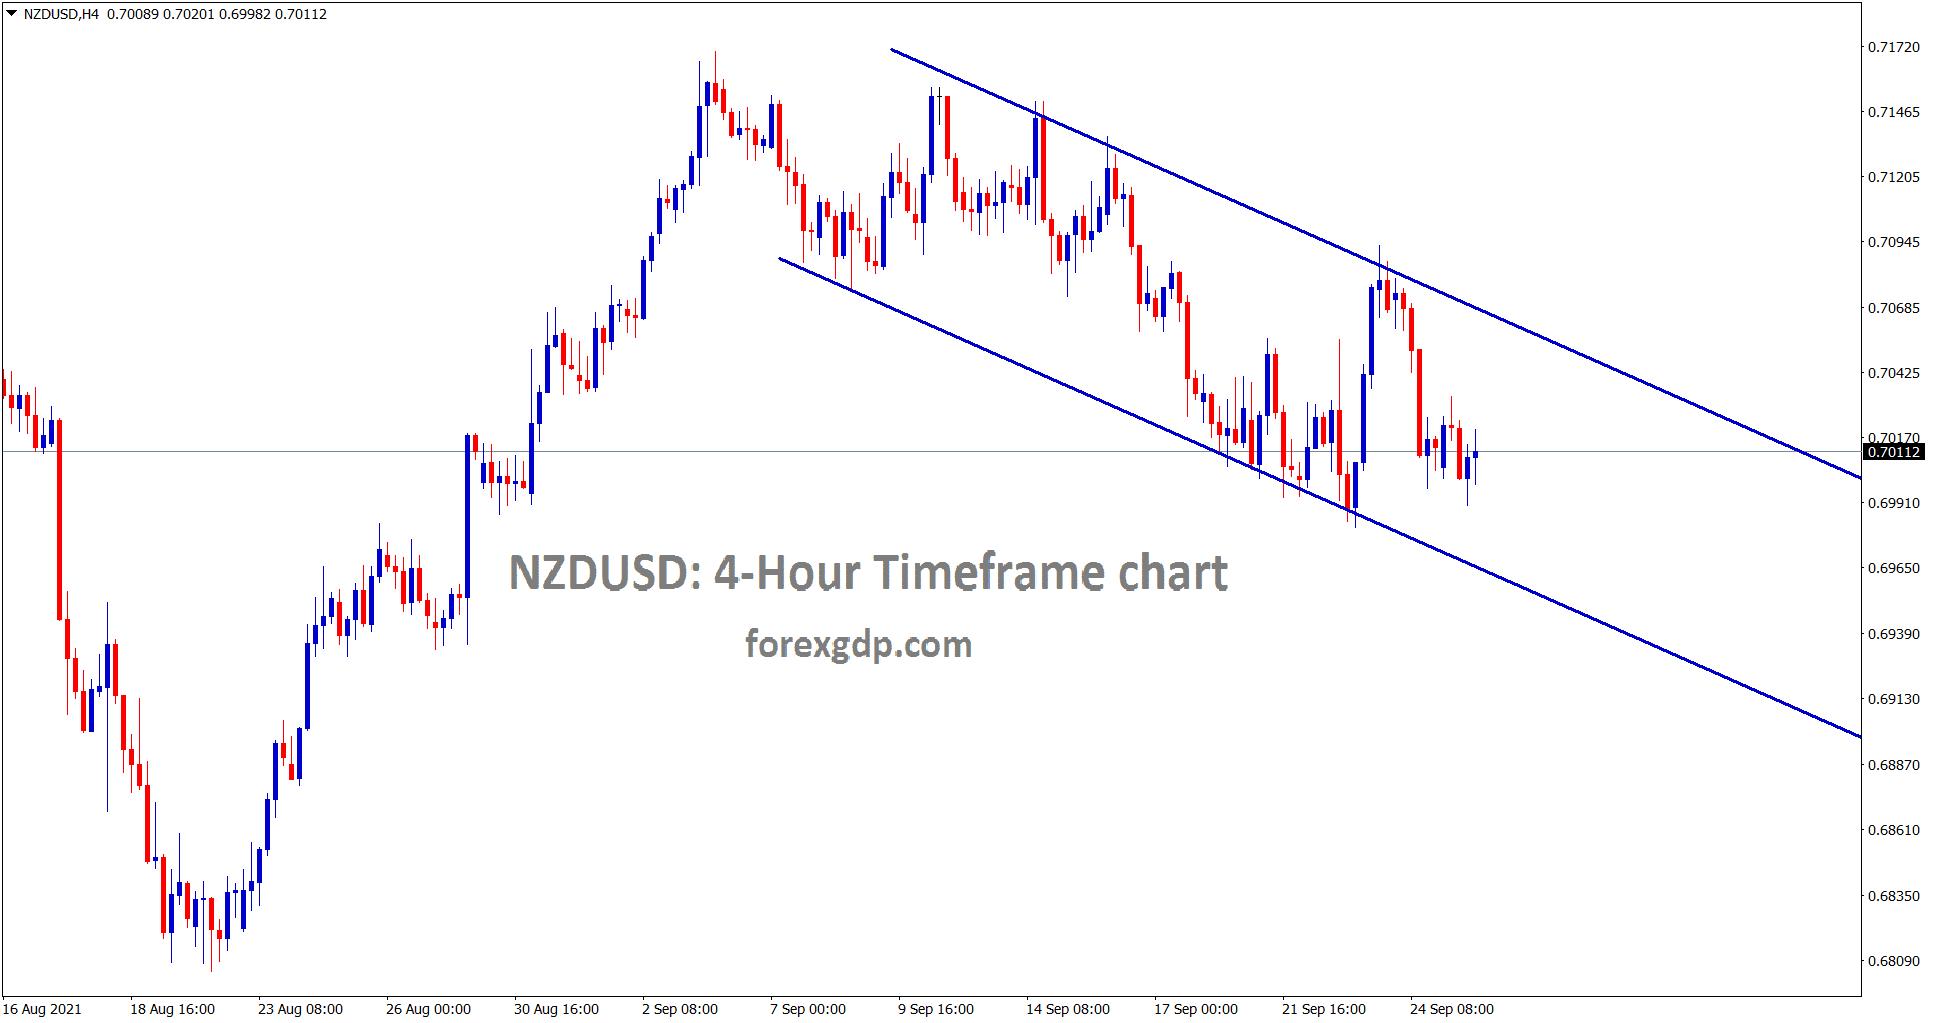 NZDUSD is moving in a small descending channel range